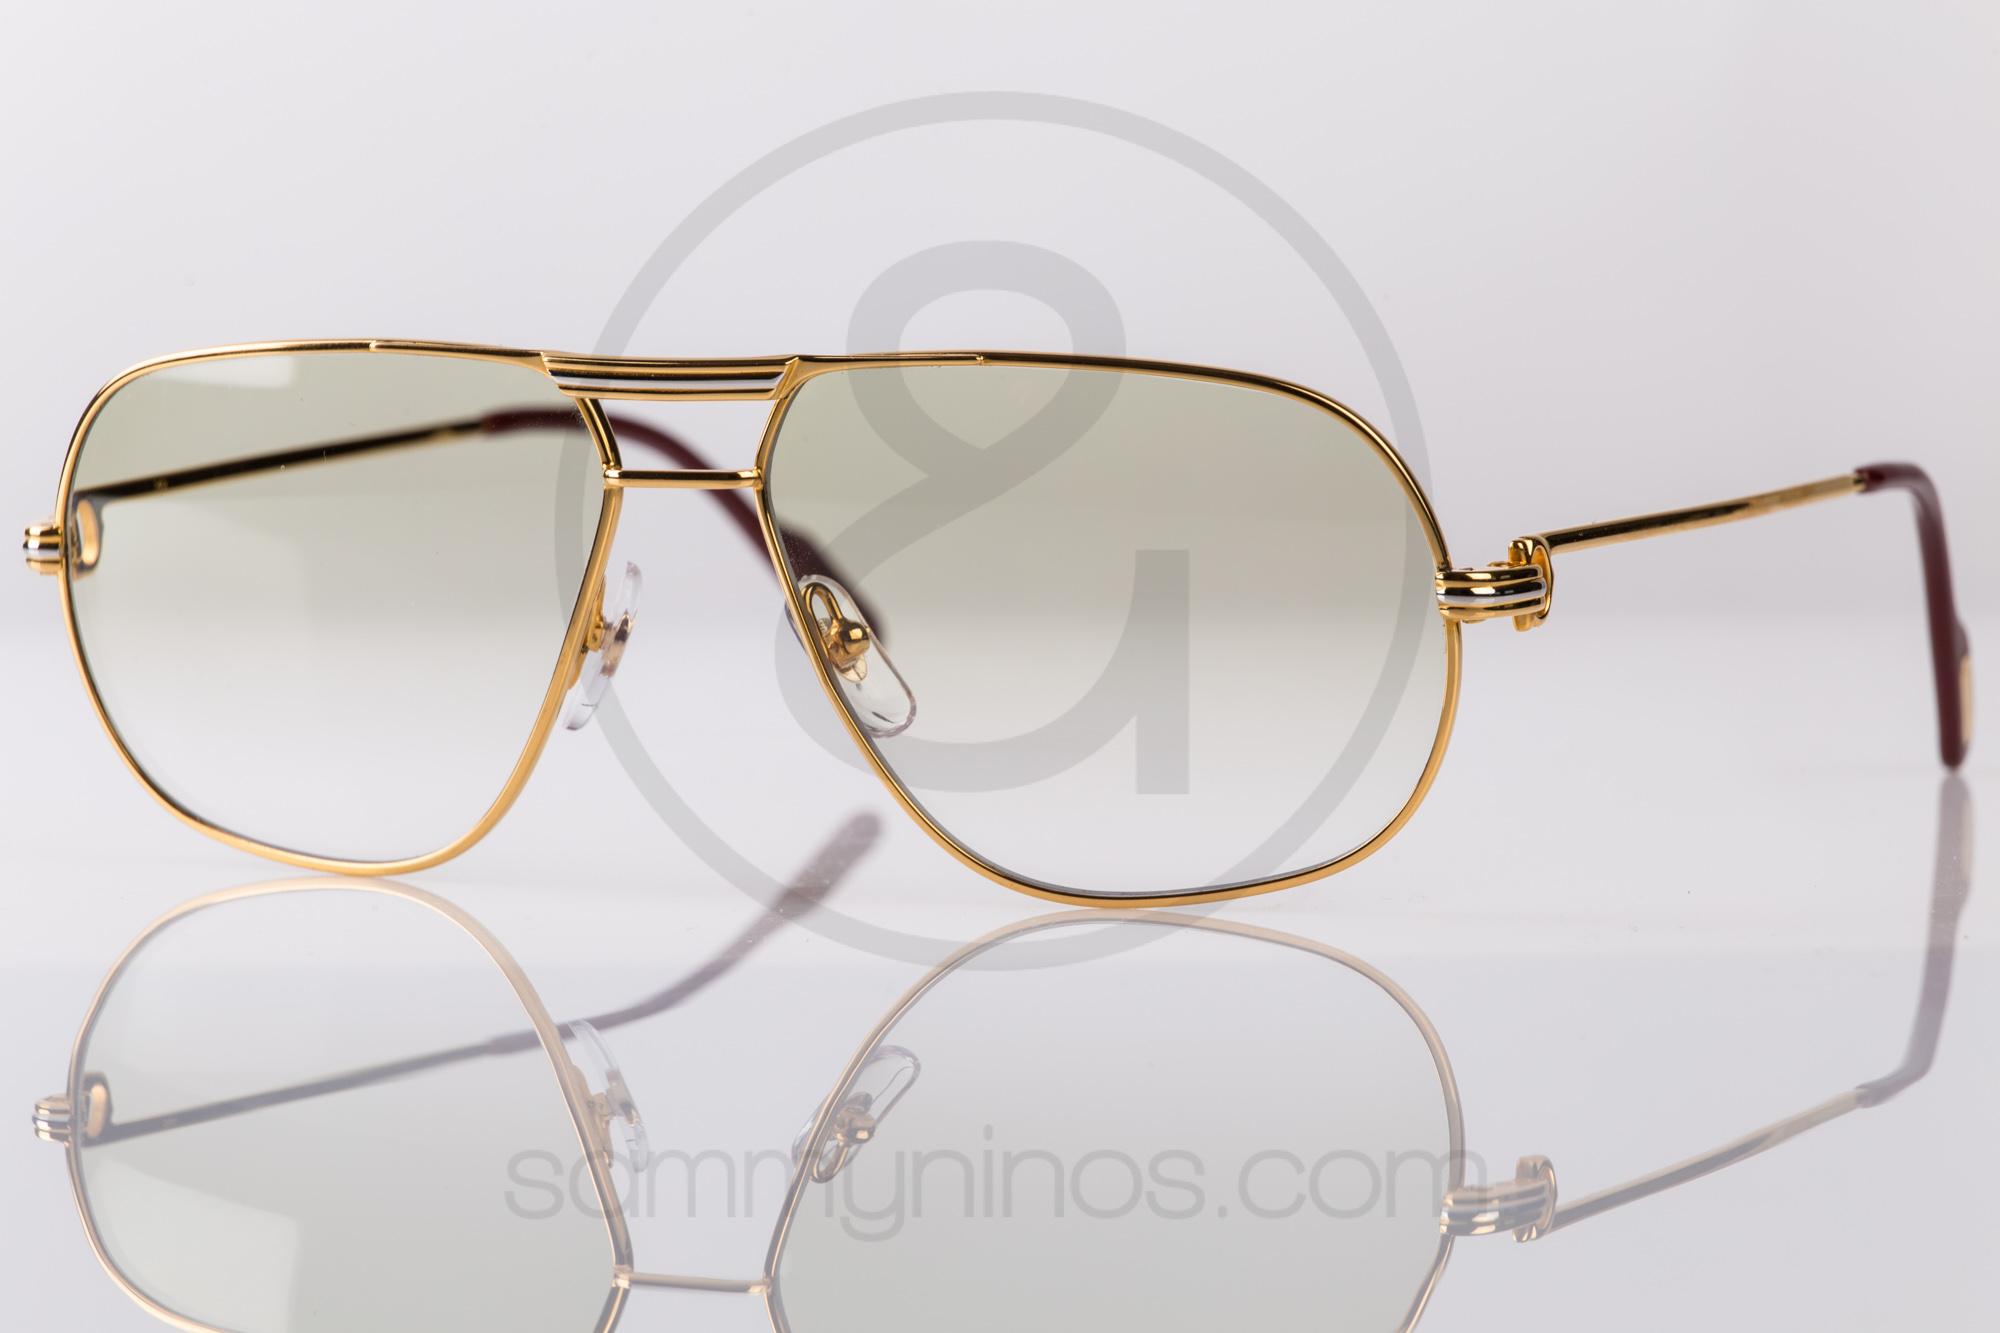 ebfa28ee813 Cartier Paris 140 Glasses - Image Of Glasses